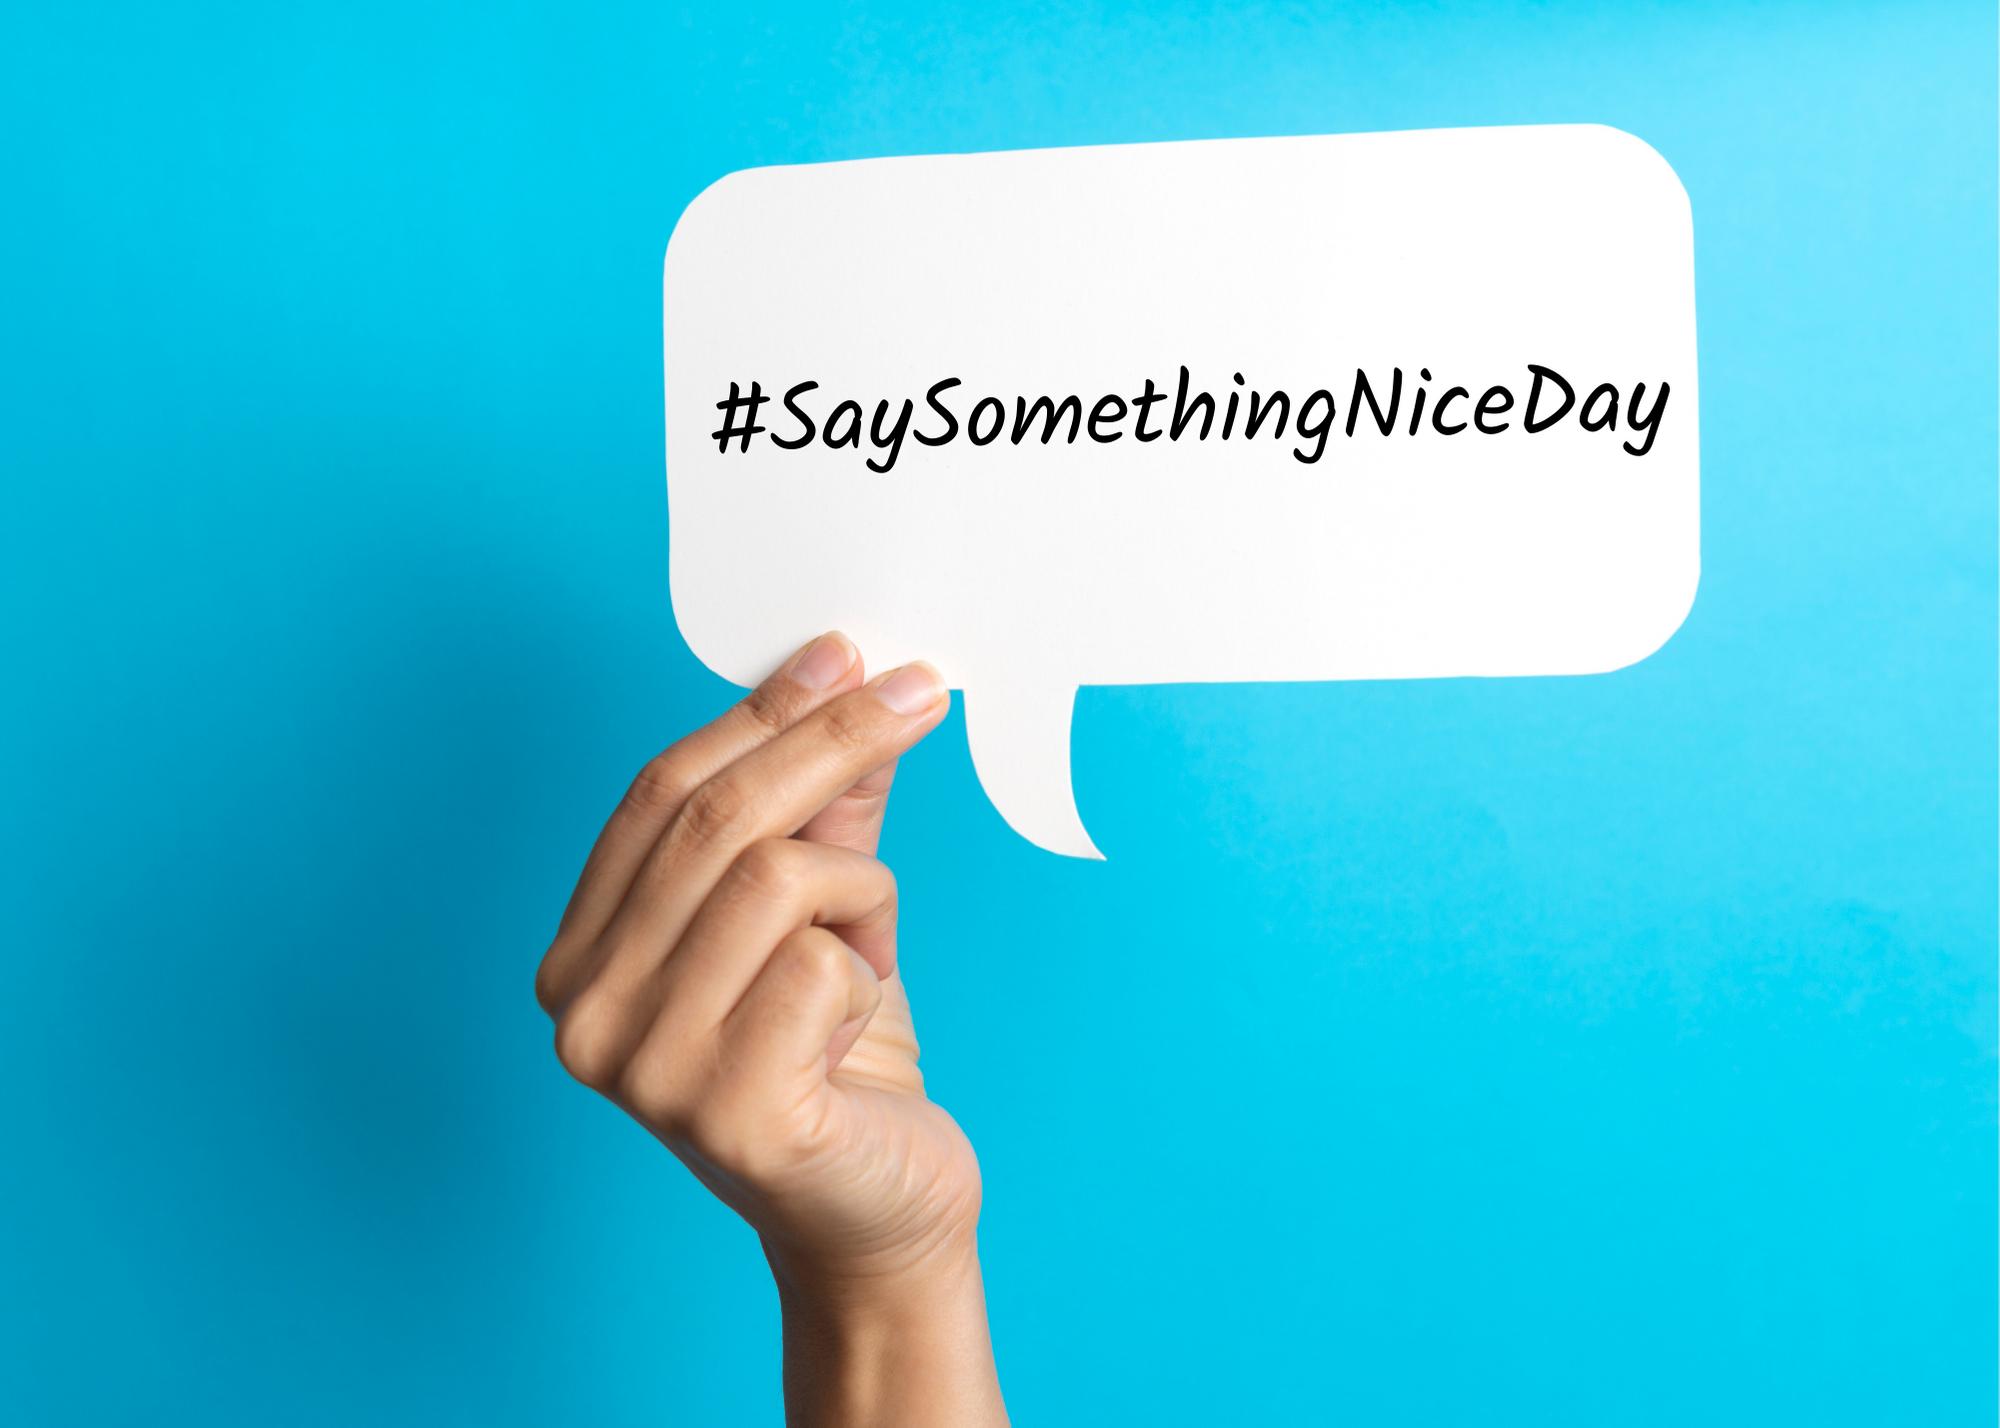 #SaySomethingNiceDay